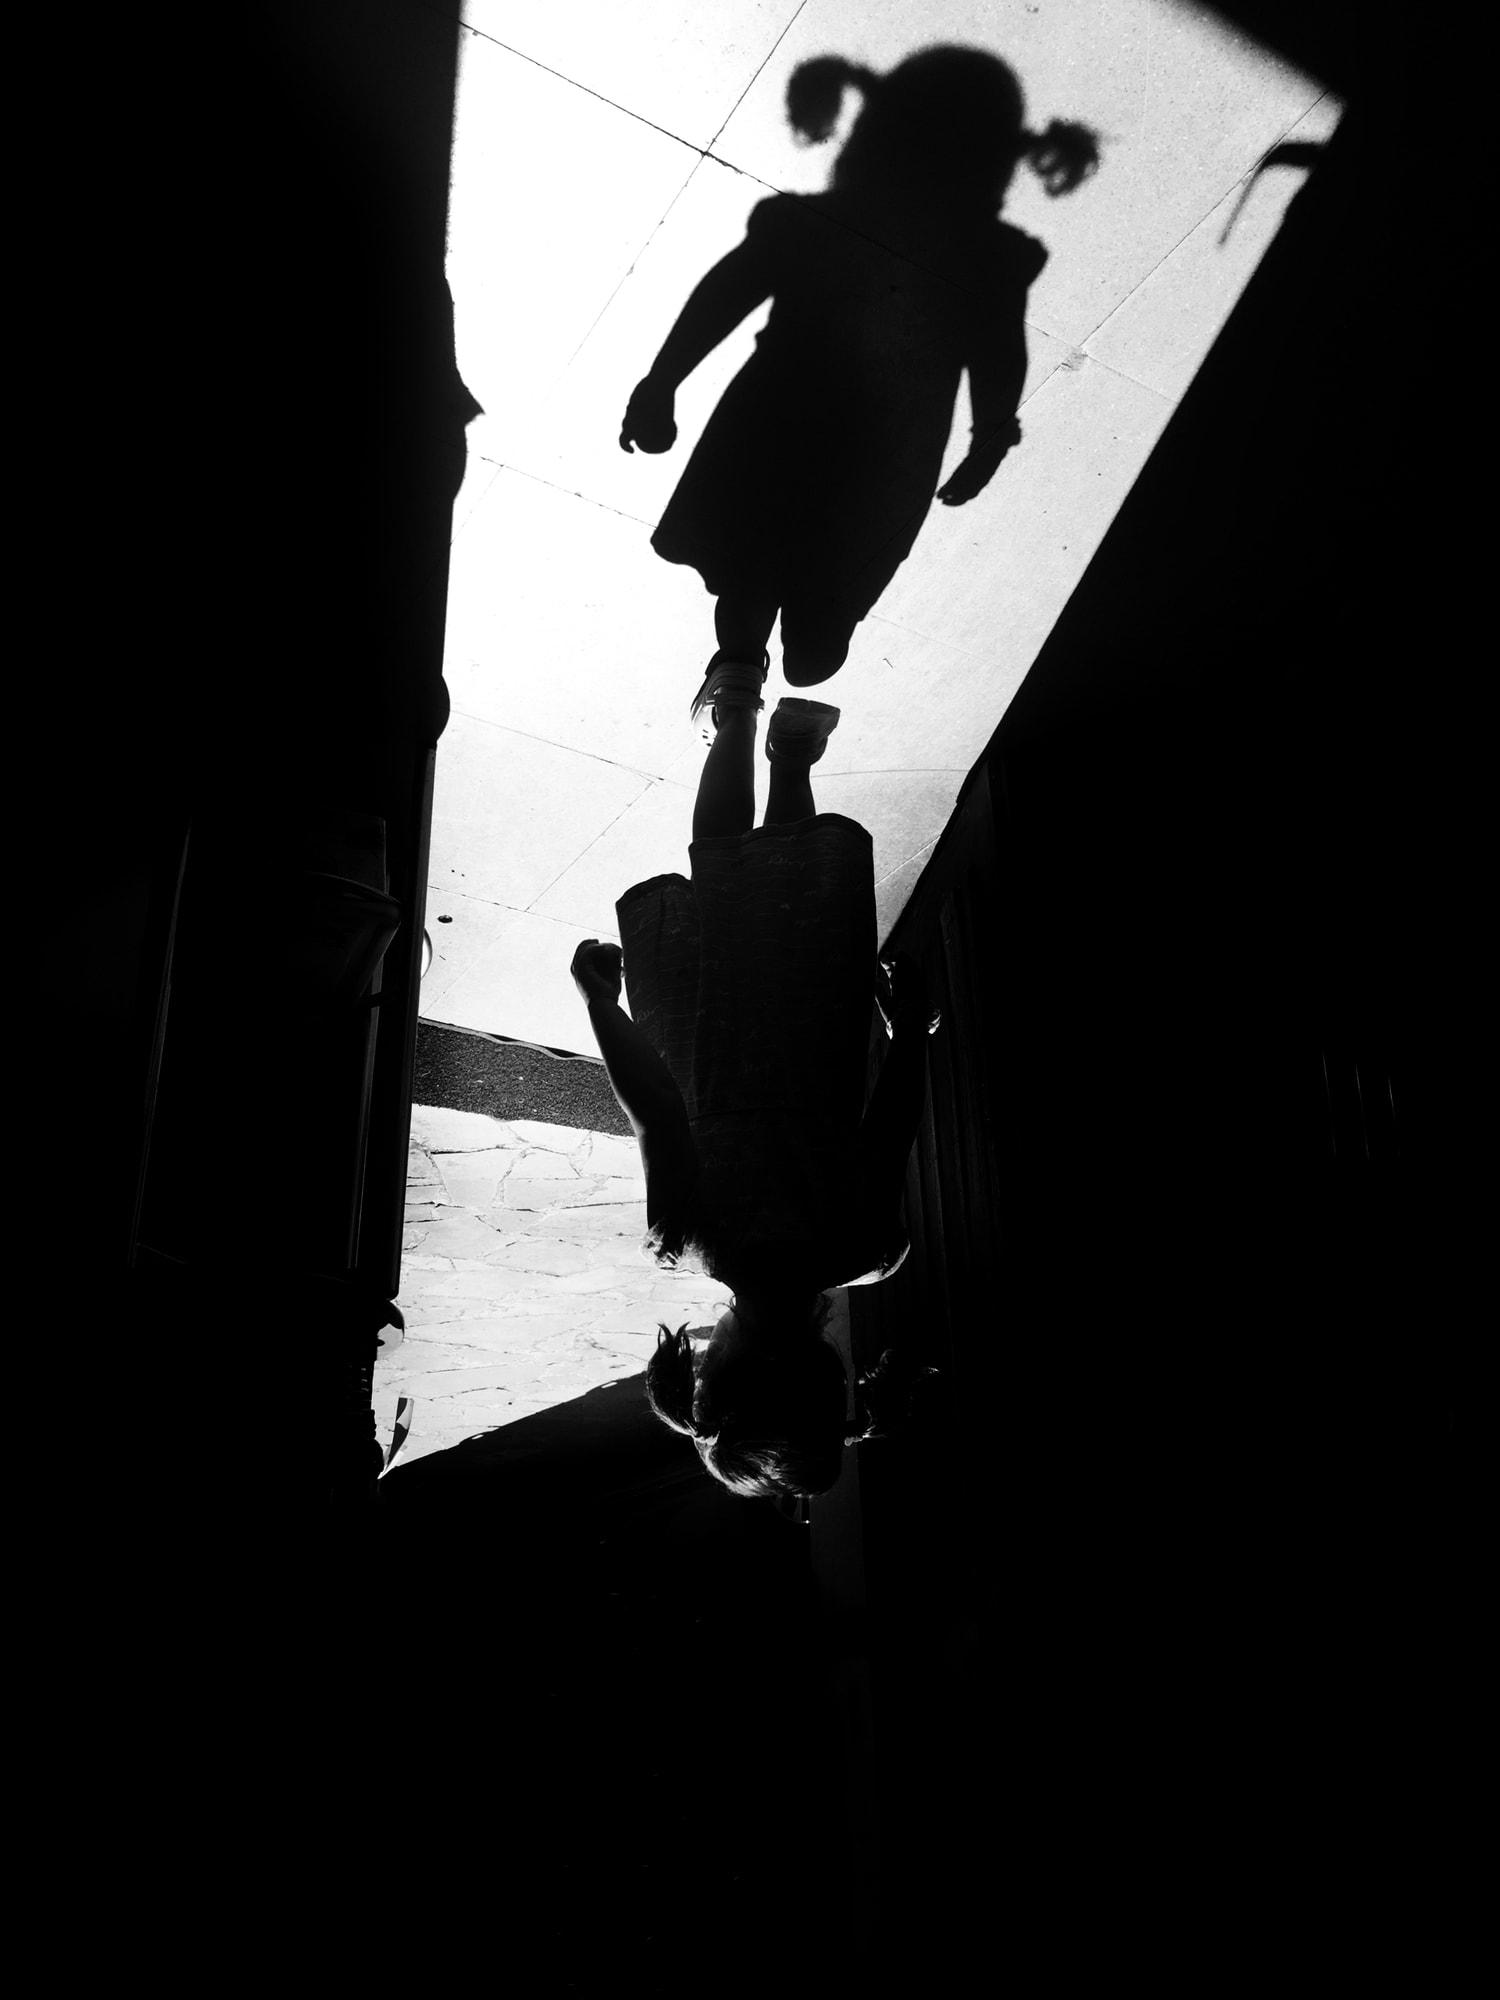 forografía de una silueta de niña